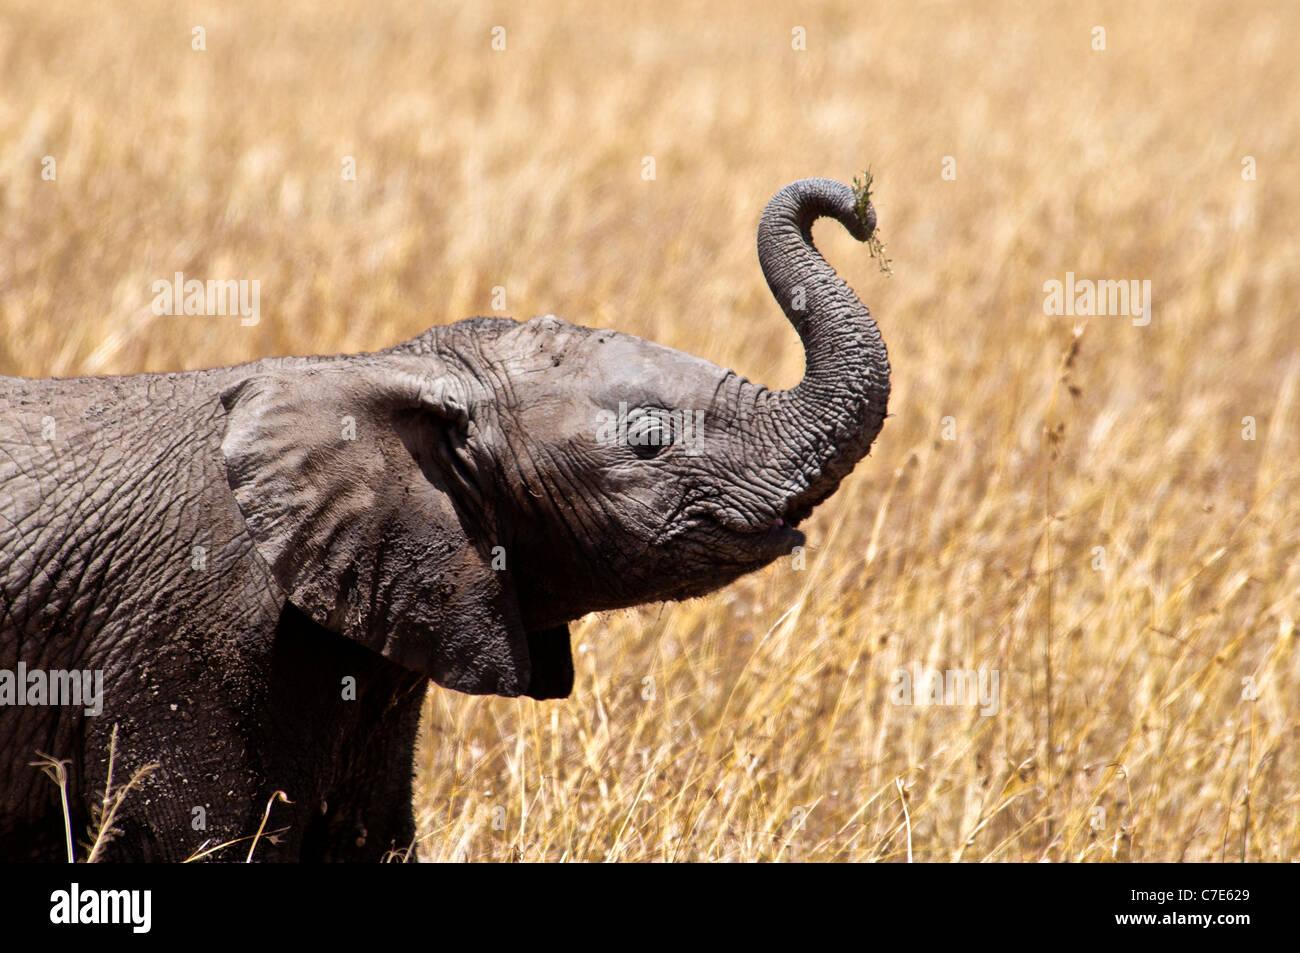 Baby Elefante africano Loxodonta africana, tronco sollevato, il Masai Mara riserva nazionale, Kenya, Africa Immagini Stock